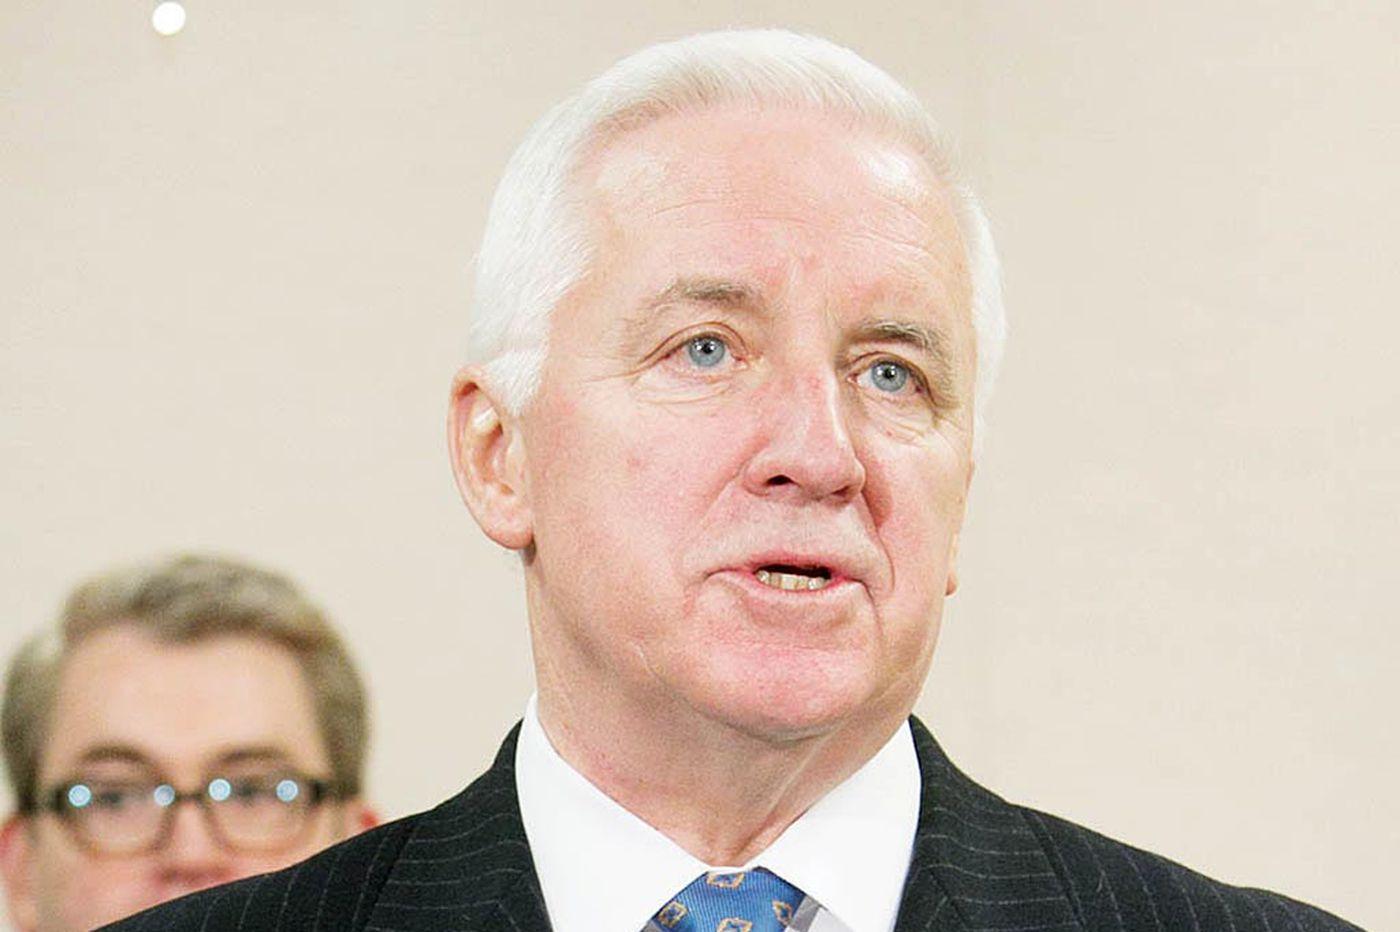 Poll: Corbett speaks what he believes ... but few like what he's saying